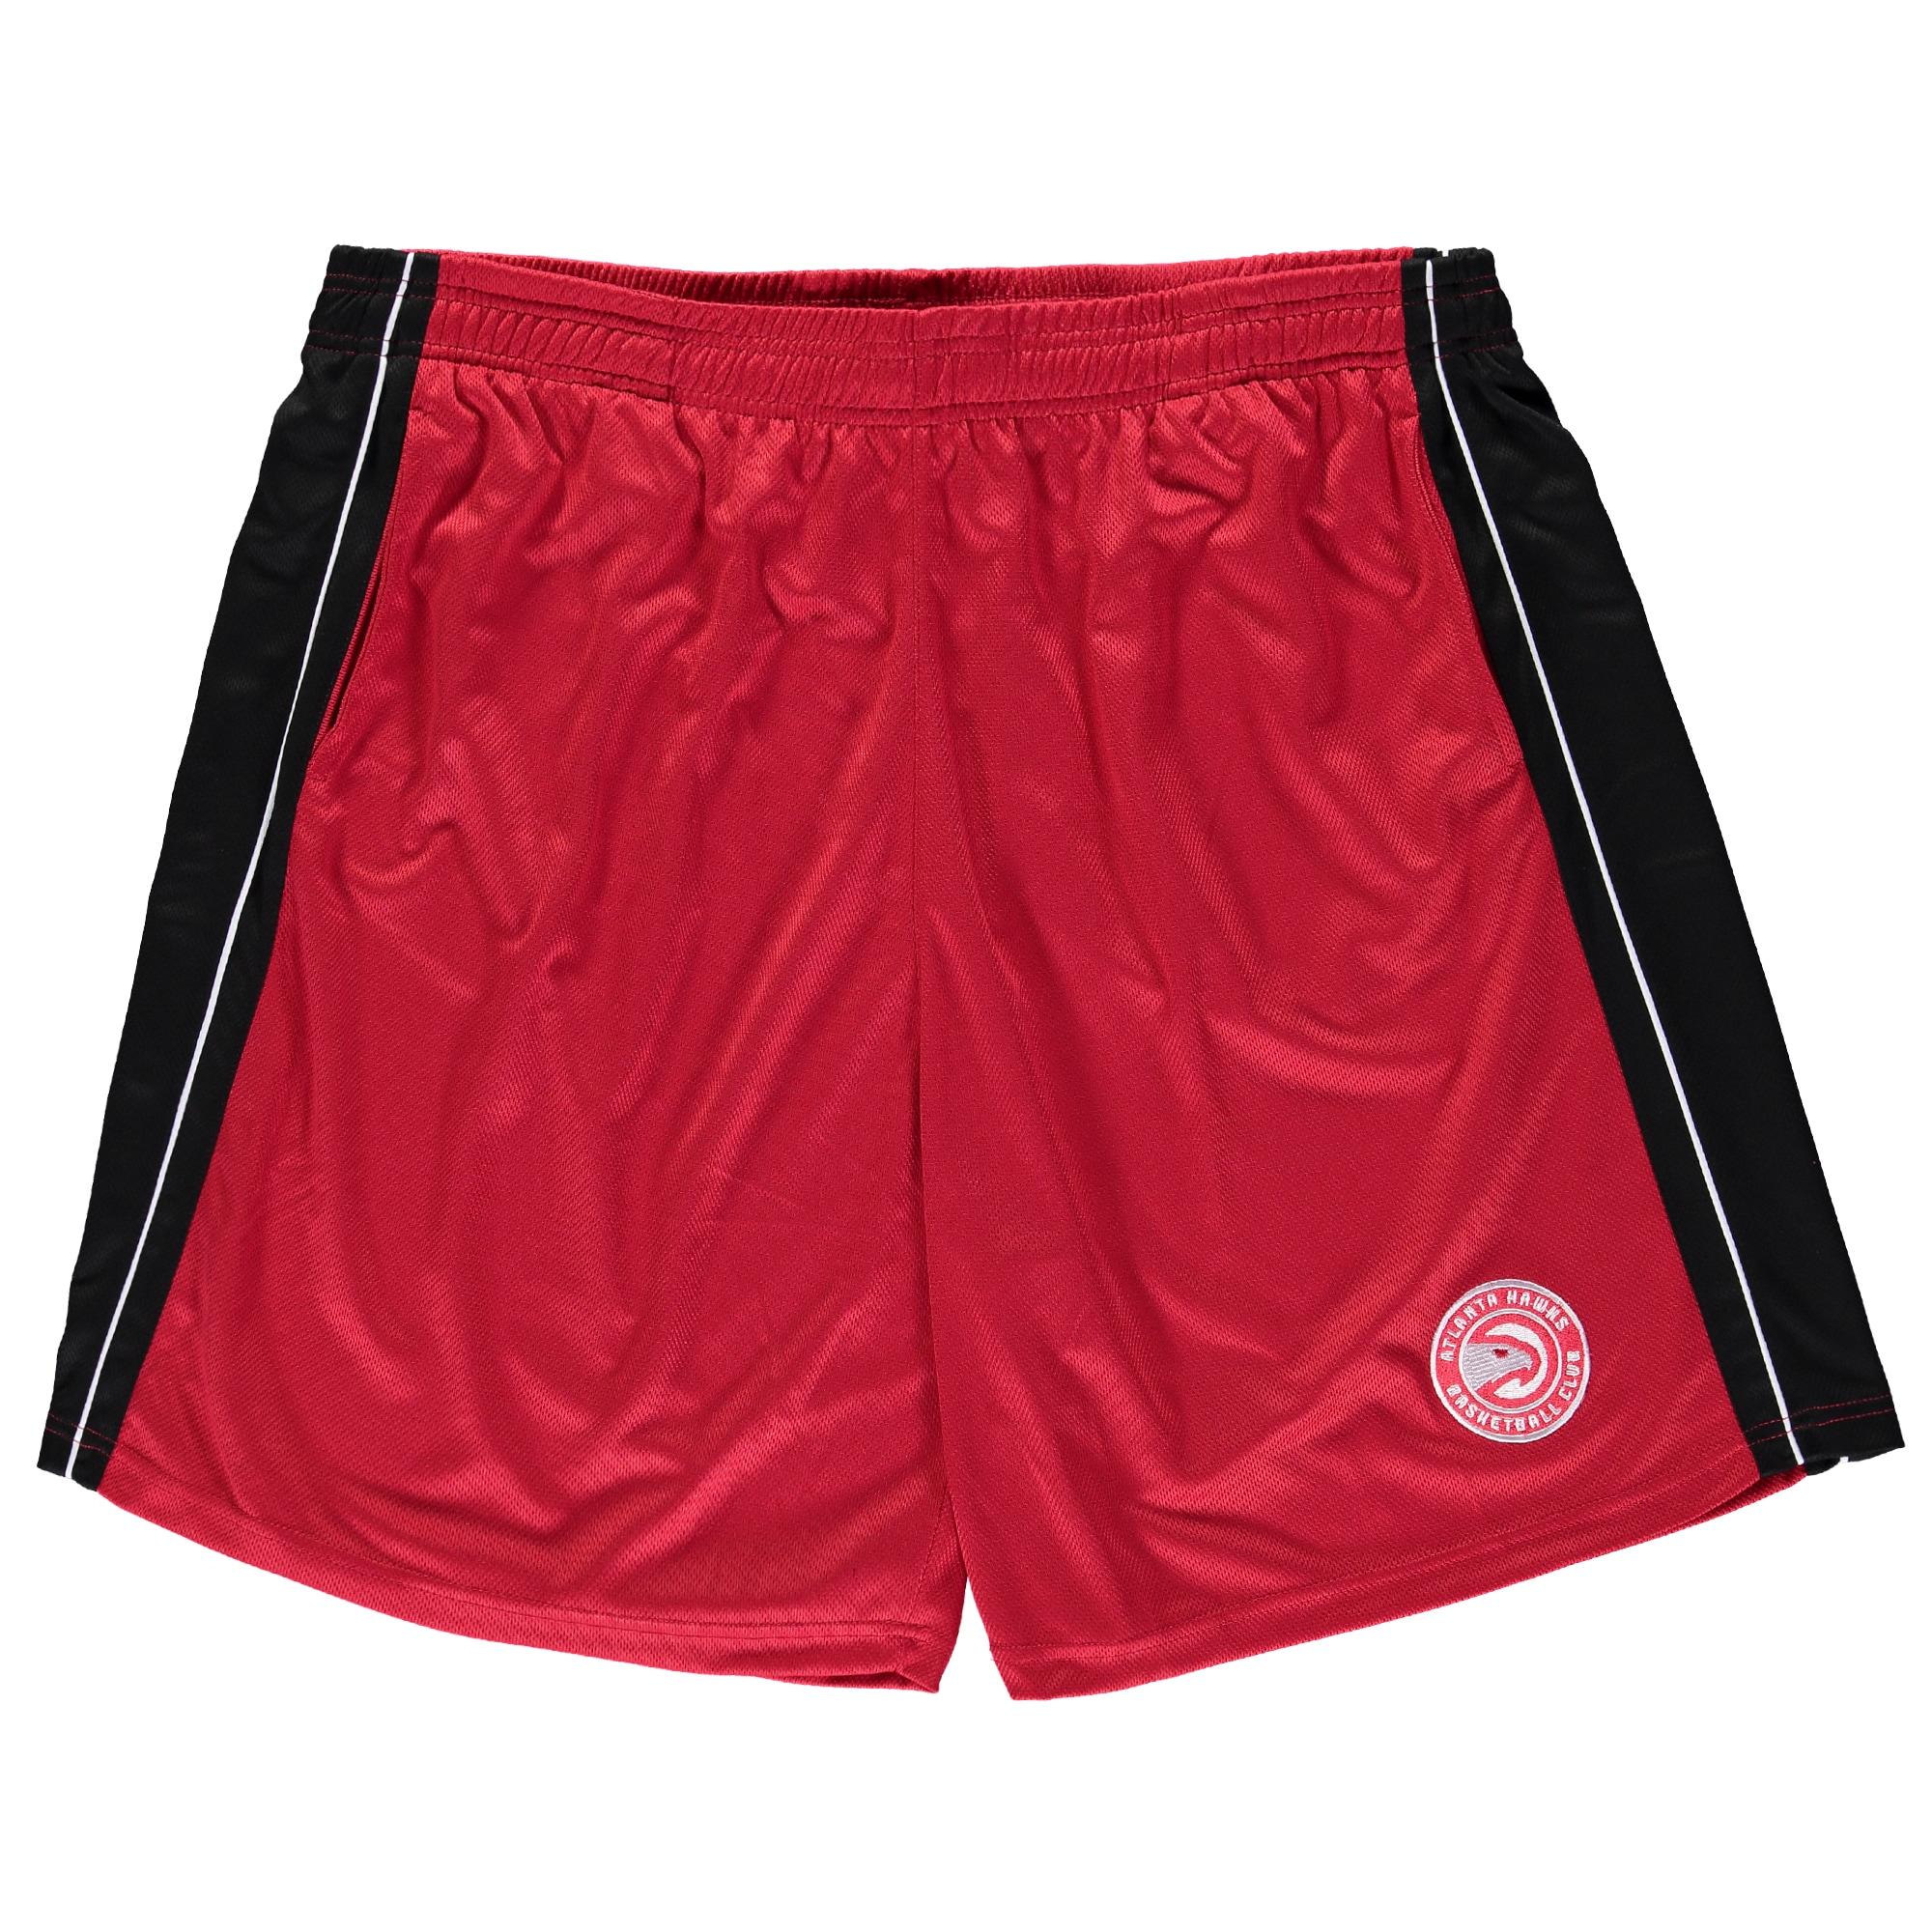 Atlanta Hawks Majestic Big & Tall Birdseye Shorts - Red/Black